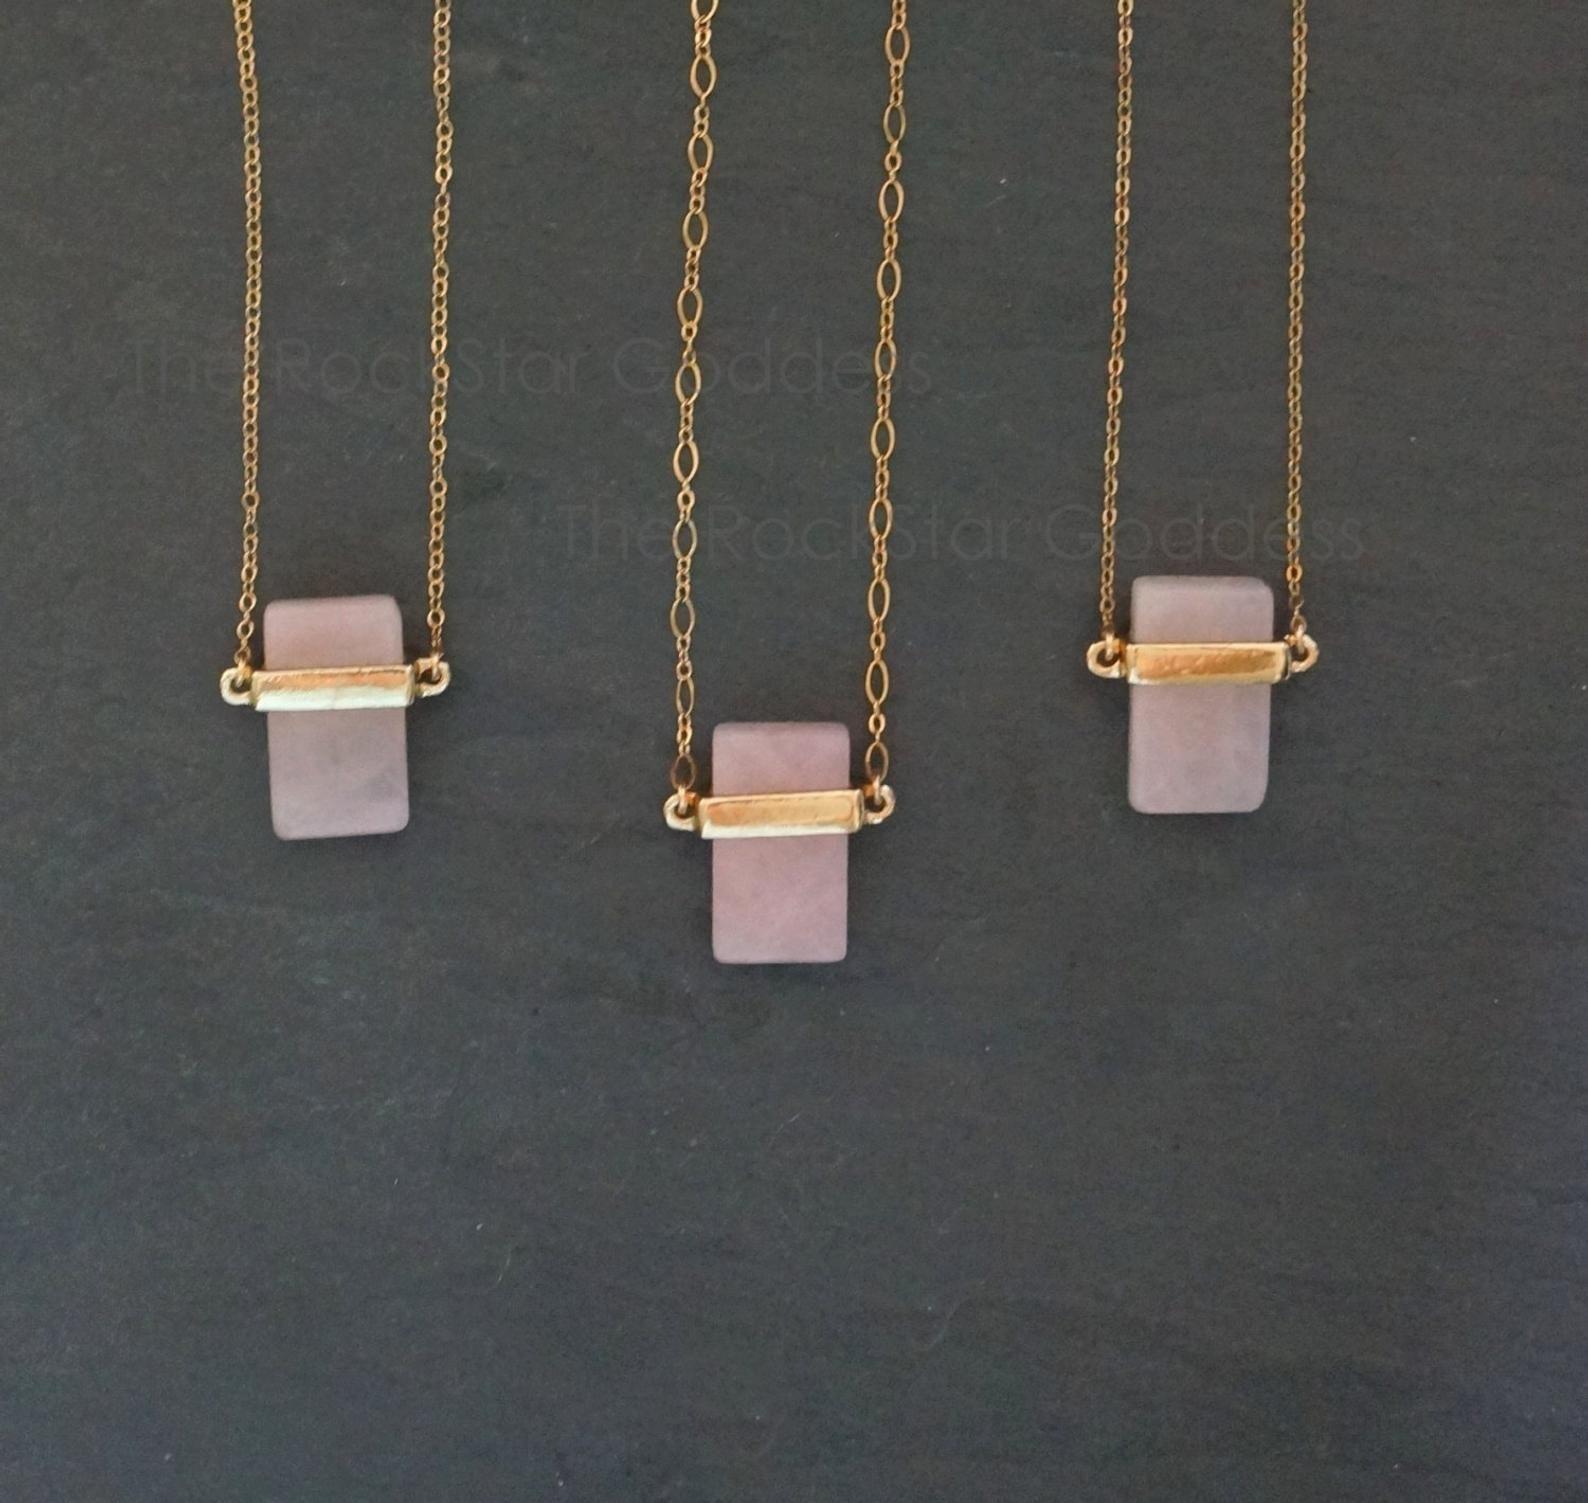 Rose Quartz Jewelry / Open Heart Chakra / Rose Quartz Necklace / Rose Quartz Pendant / Crystal Necklace